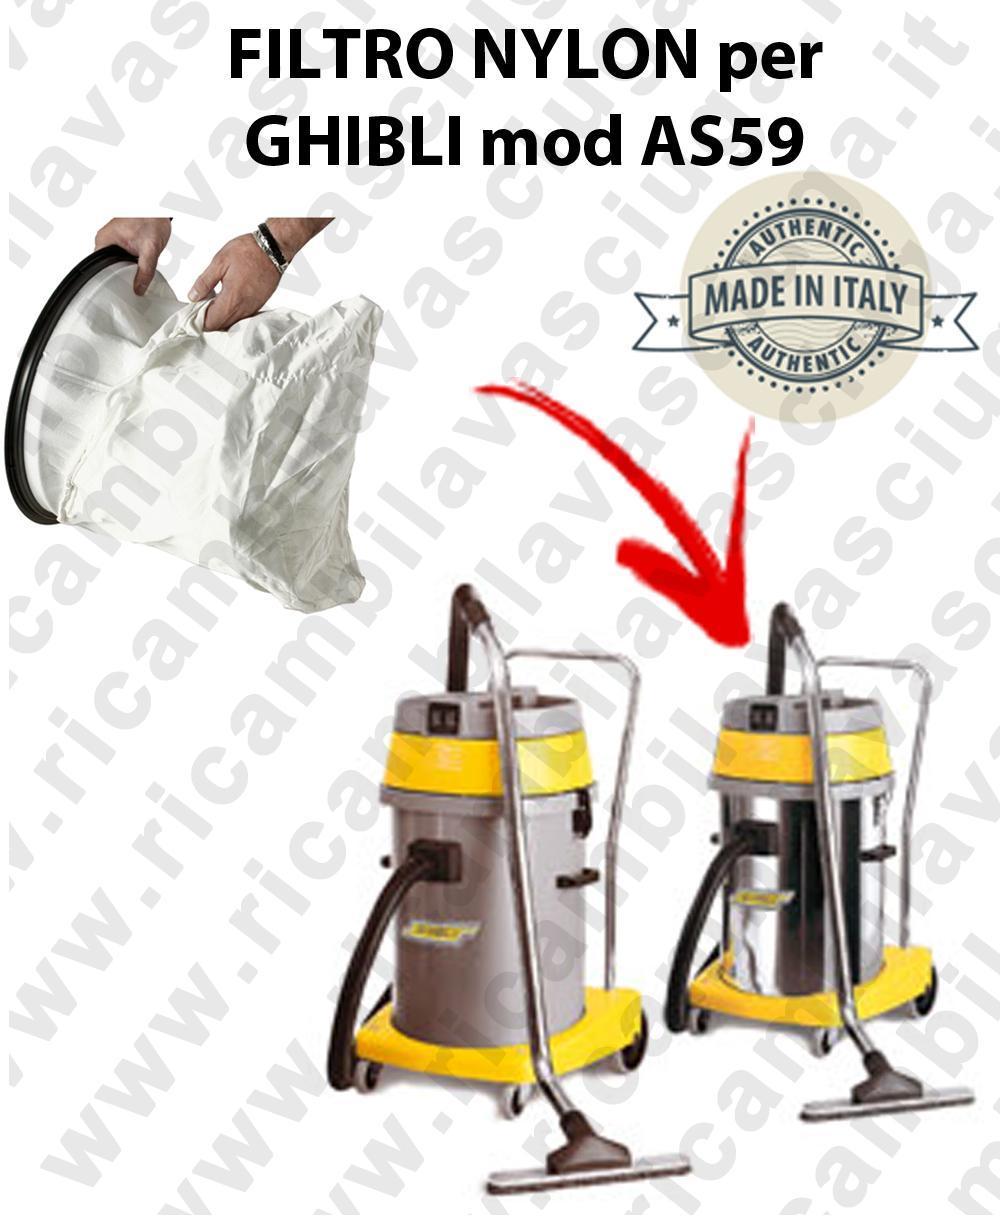 SACCO FILTRO cod: 3001220 NYLON for vacuum cleaner GHIBLI model AS59